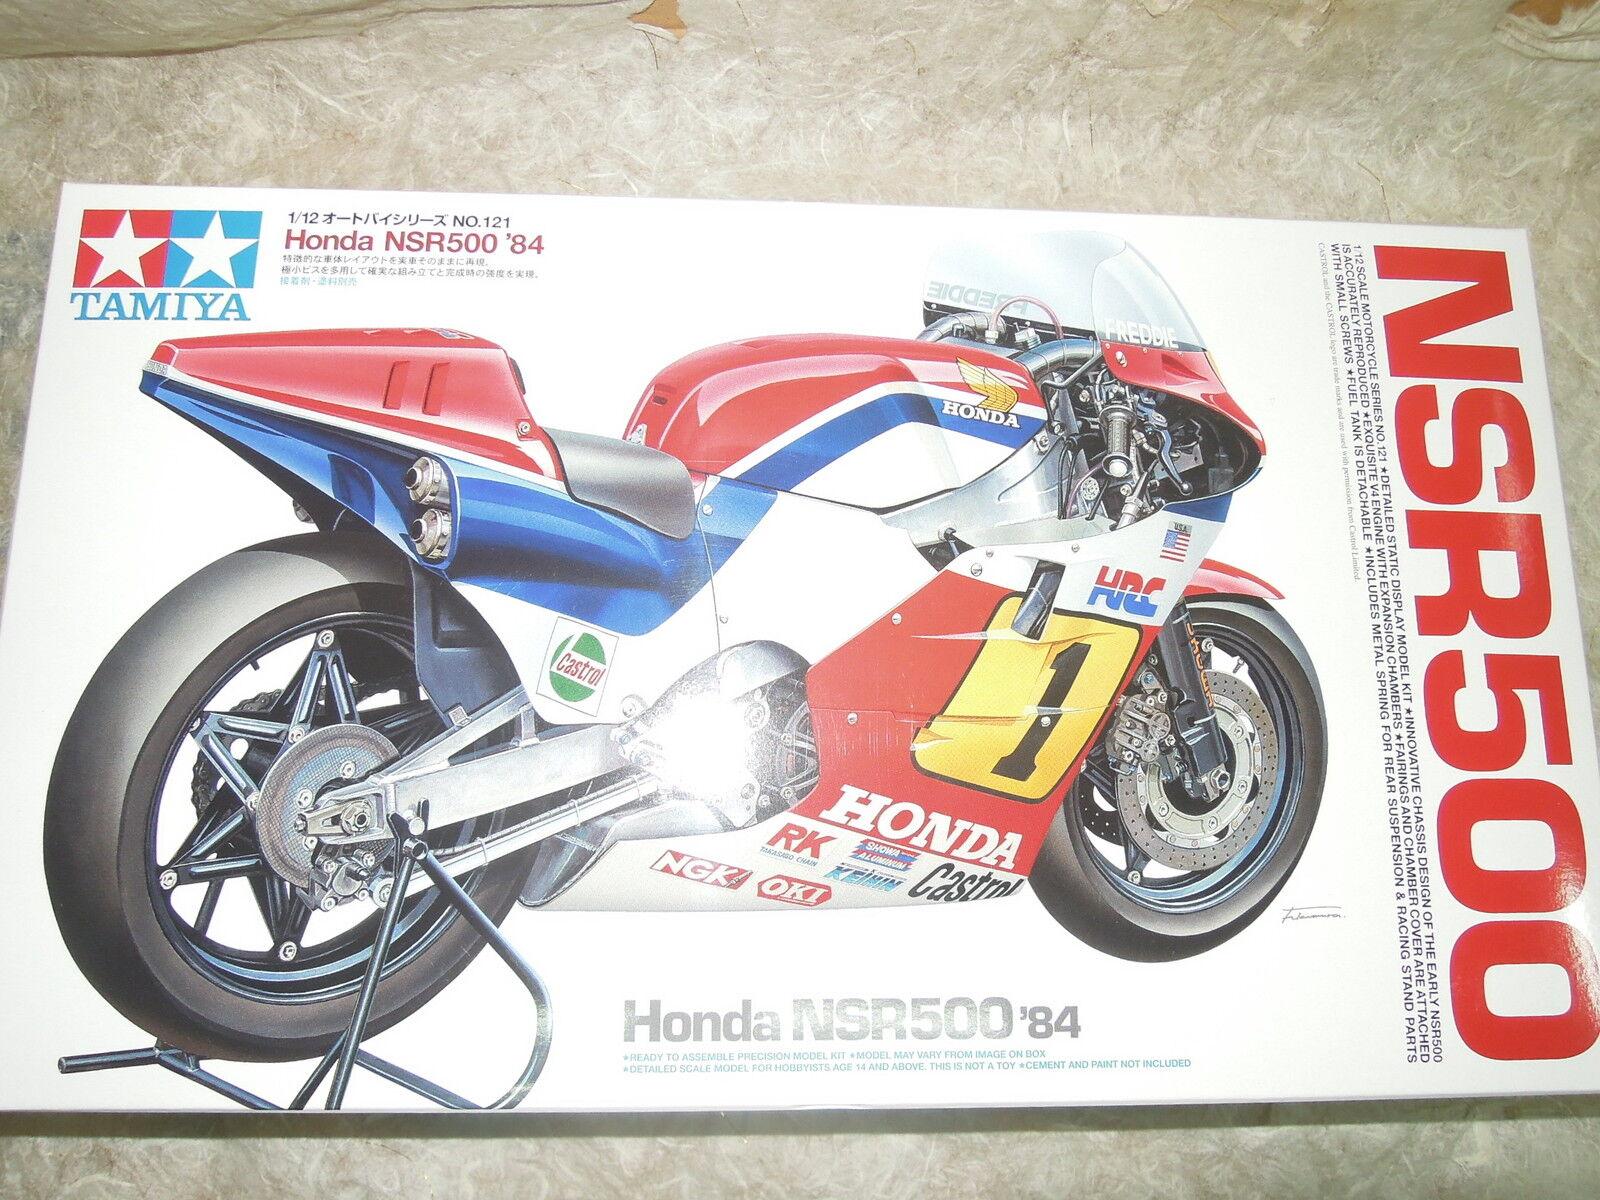 Tamiya 1 12 Honda NSR500 '84 Motocycle Model Kit + Front Fork Set